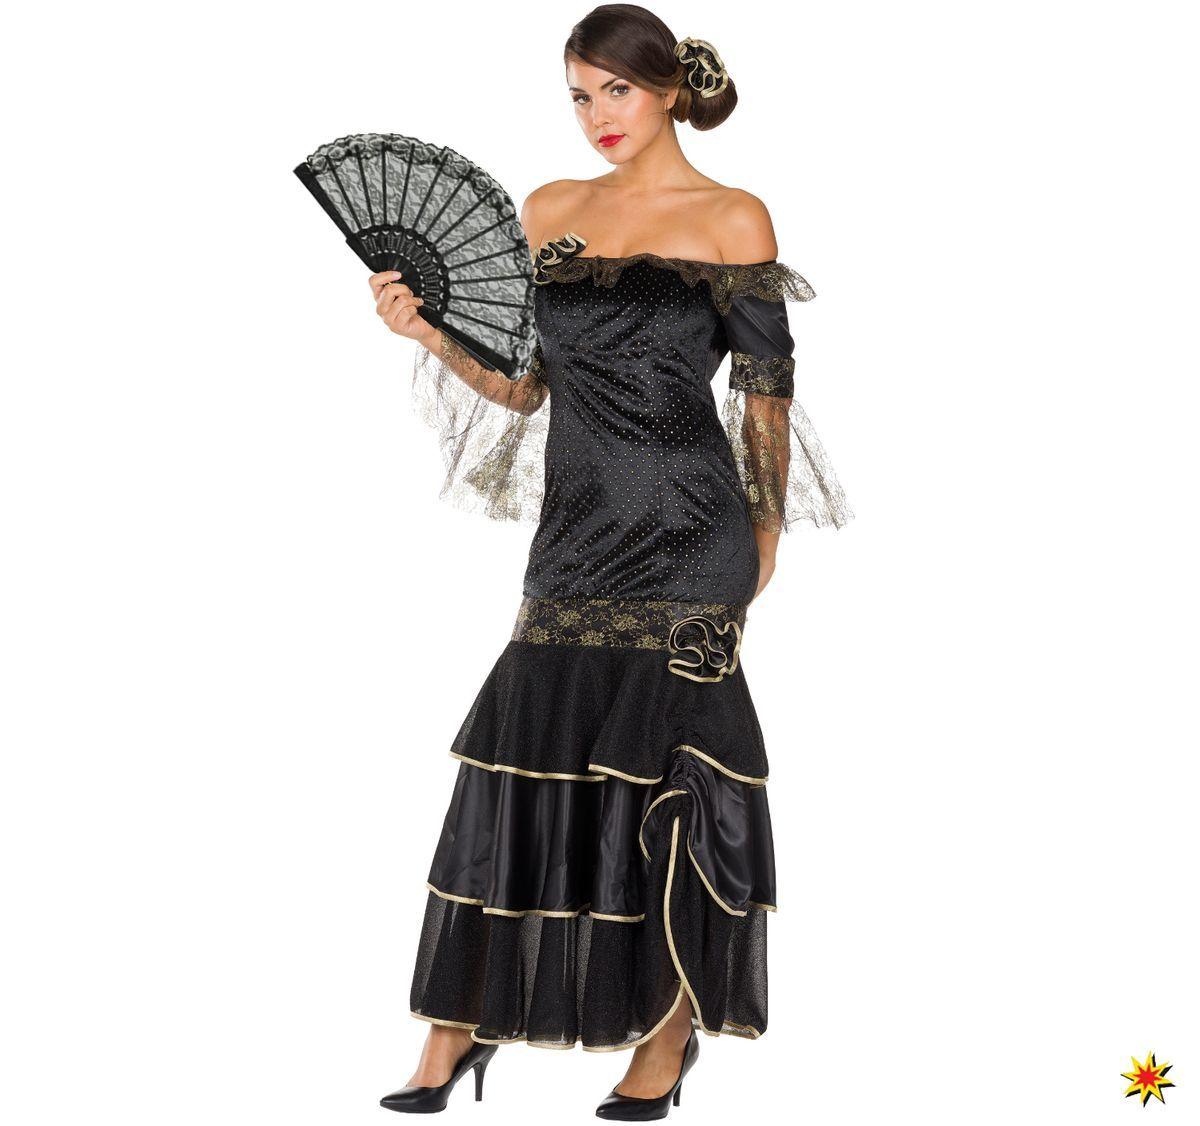 damen kostüm flamenco tänzerin lucia | flamenco kleider